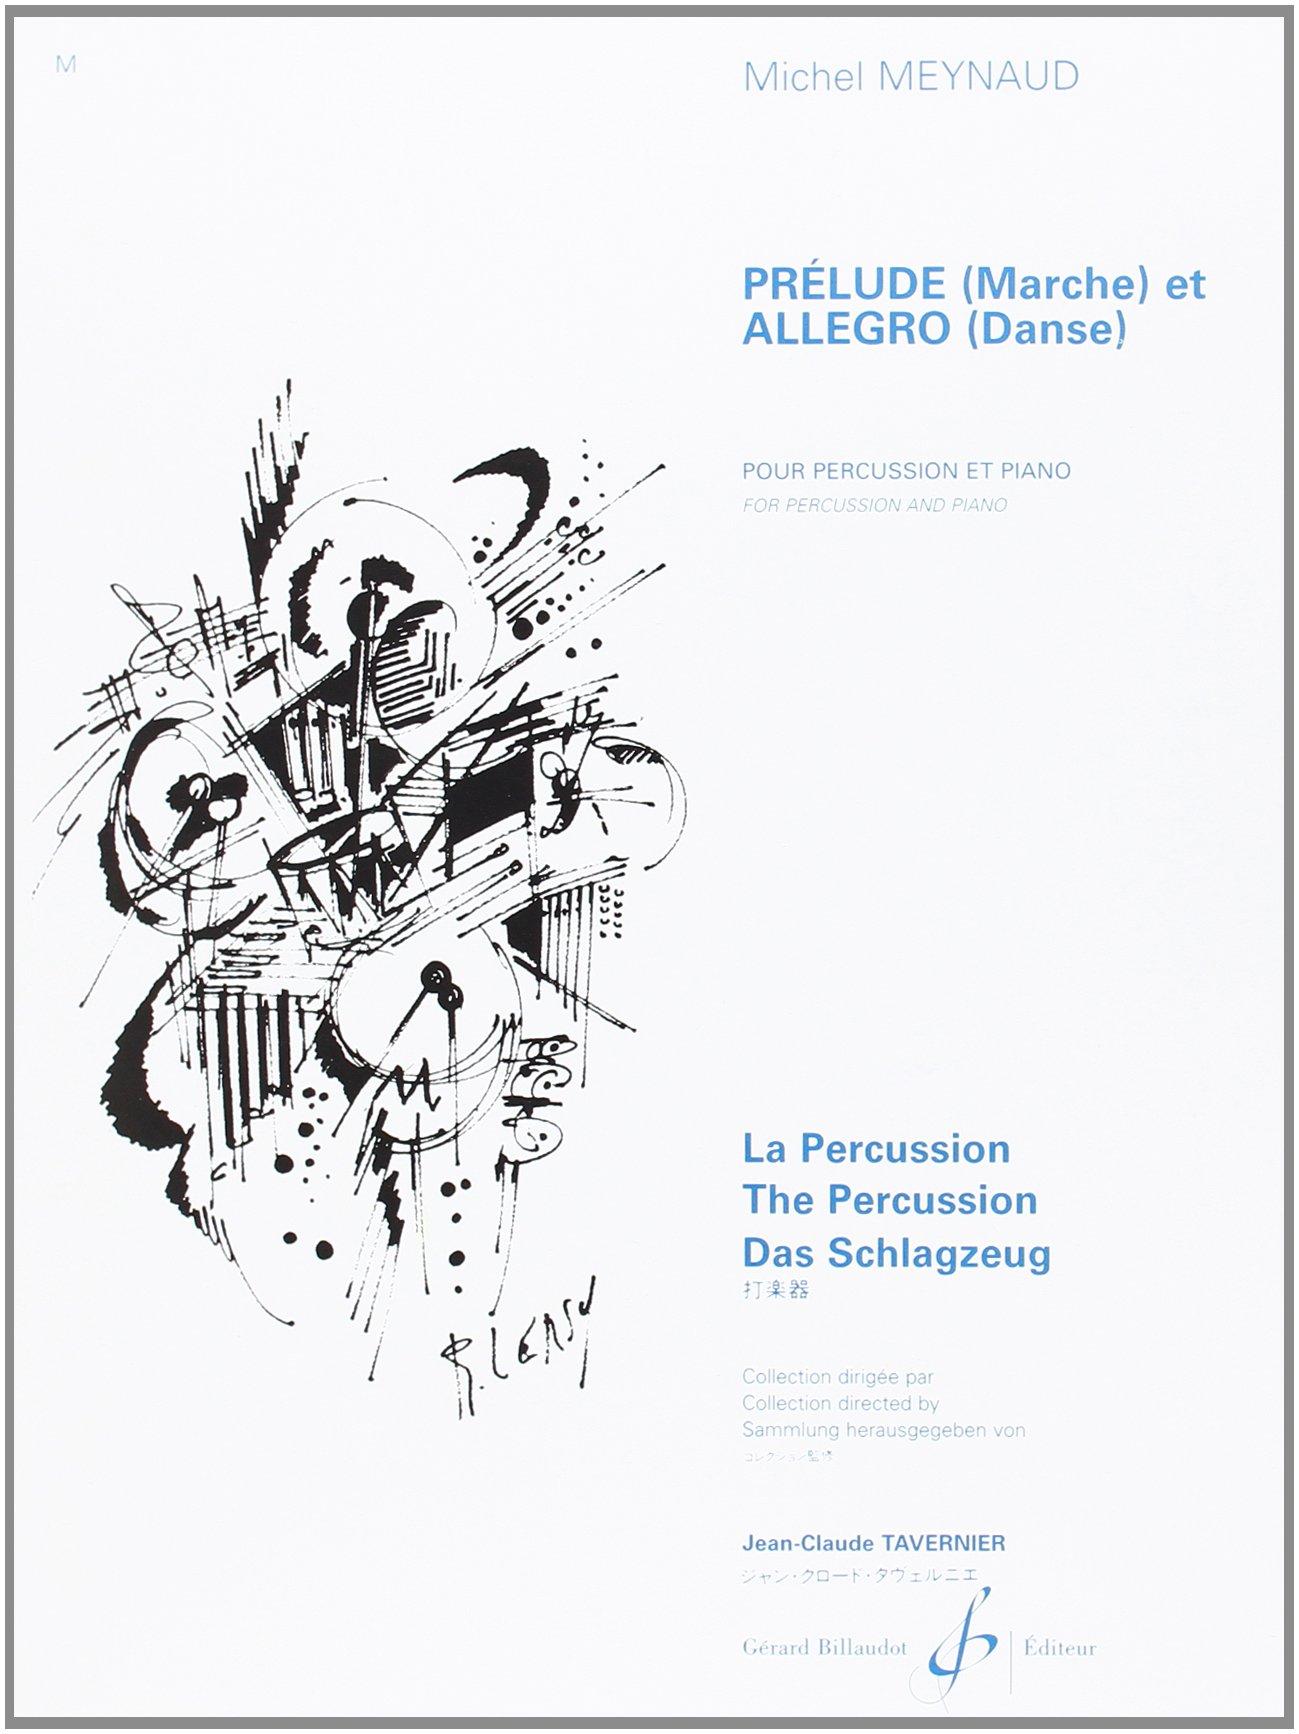 Prelude (Marche) et Allegro (Danse) Broché – 1 janvier 2000 Meynaud Michel Billaudot B003JYOKAK